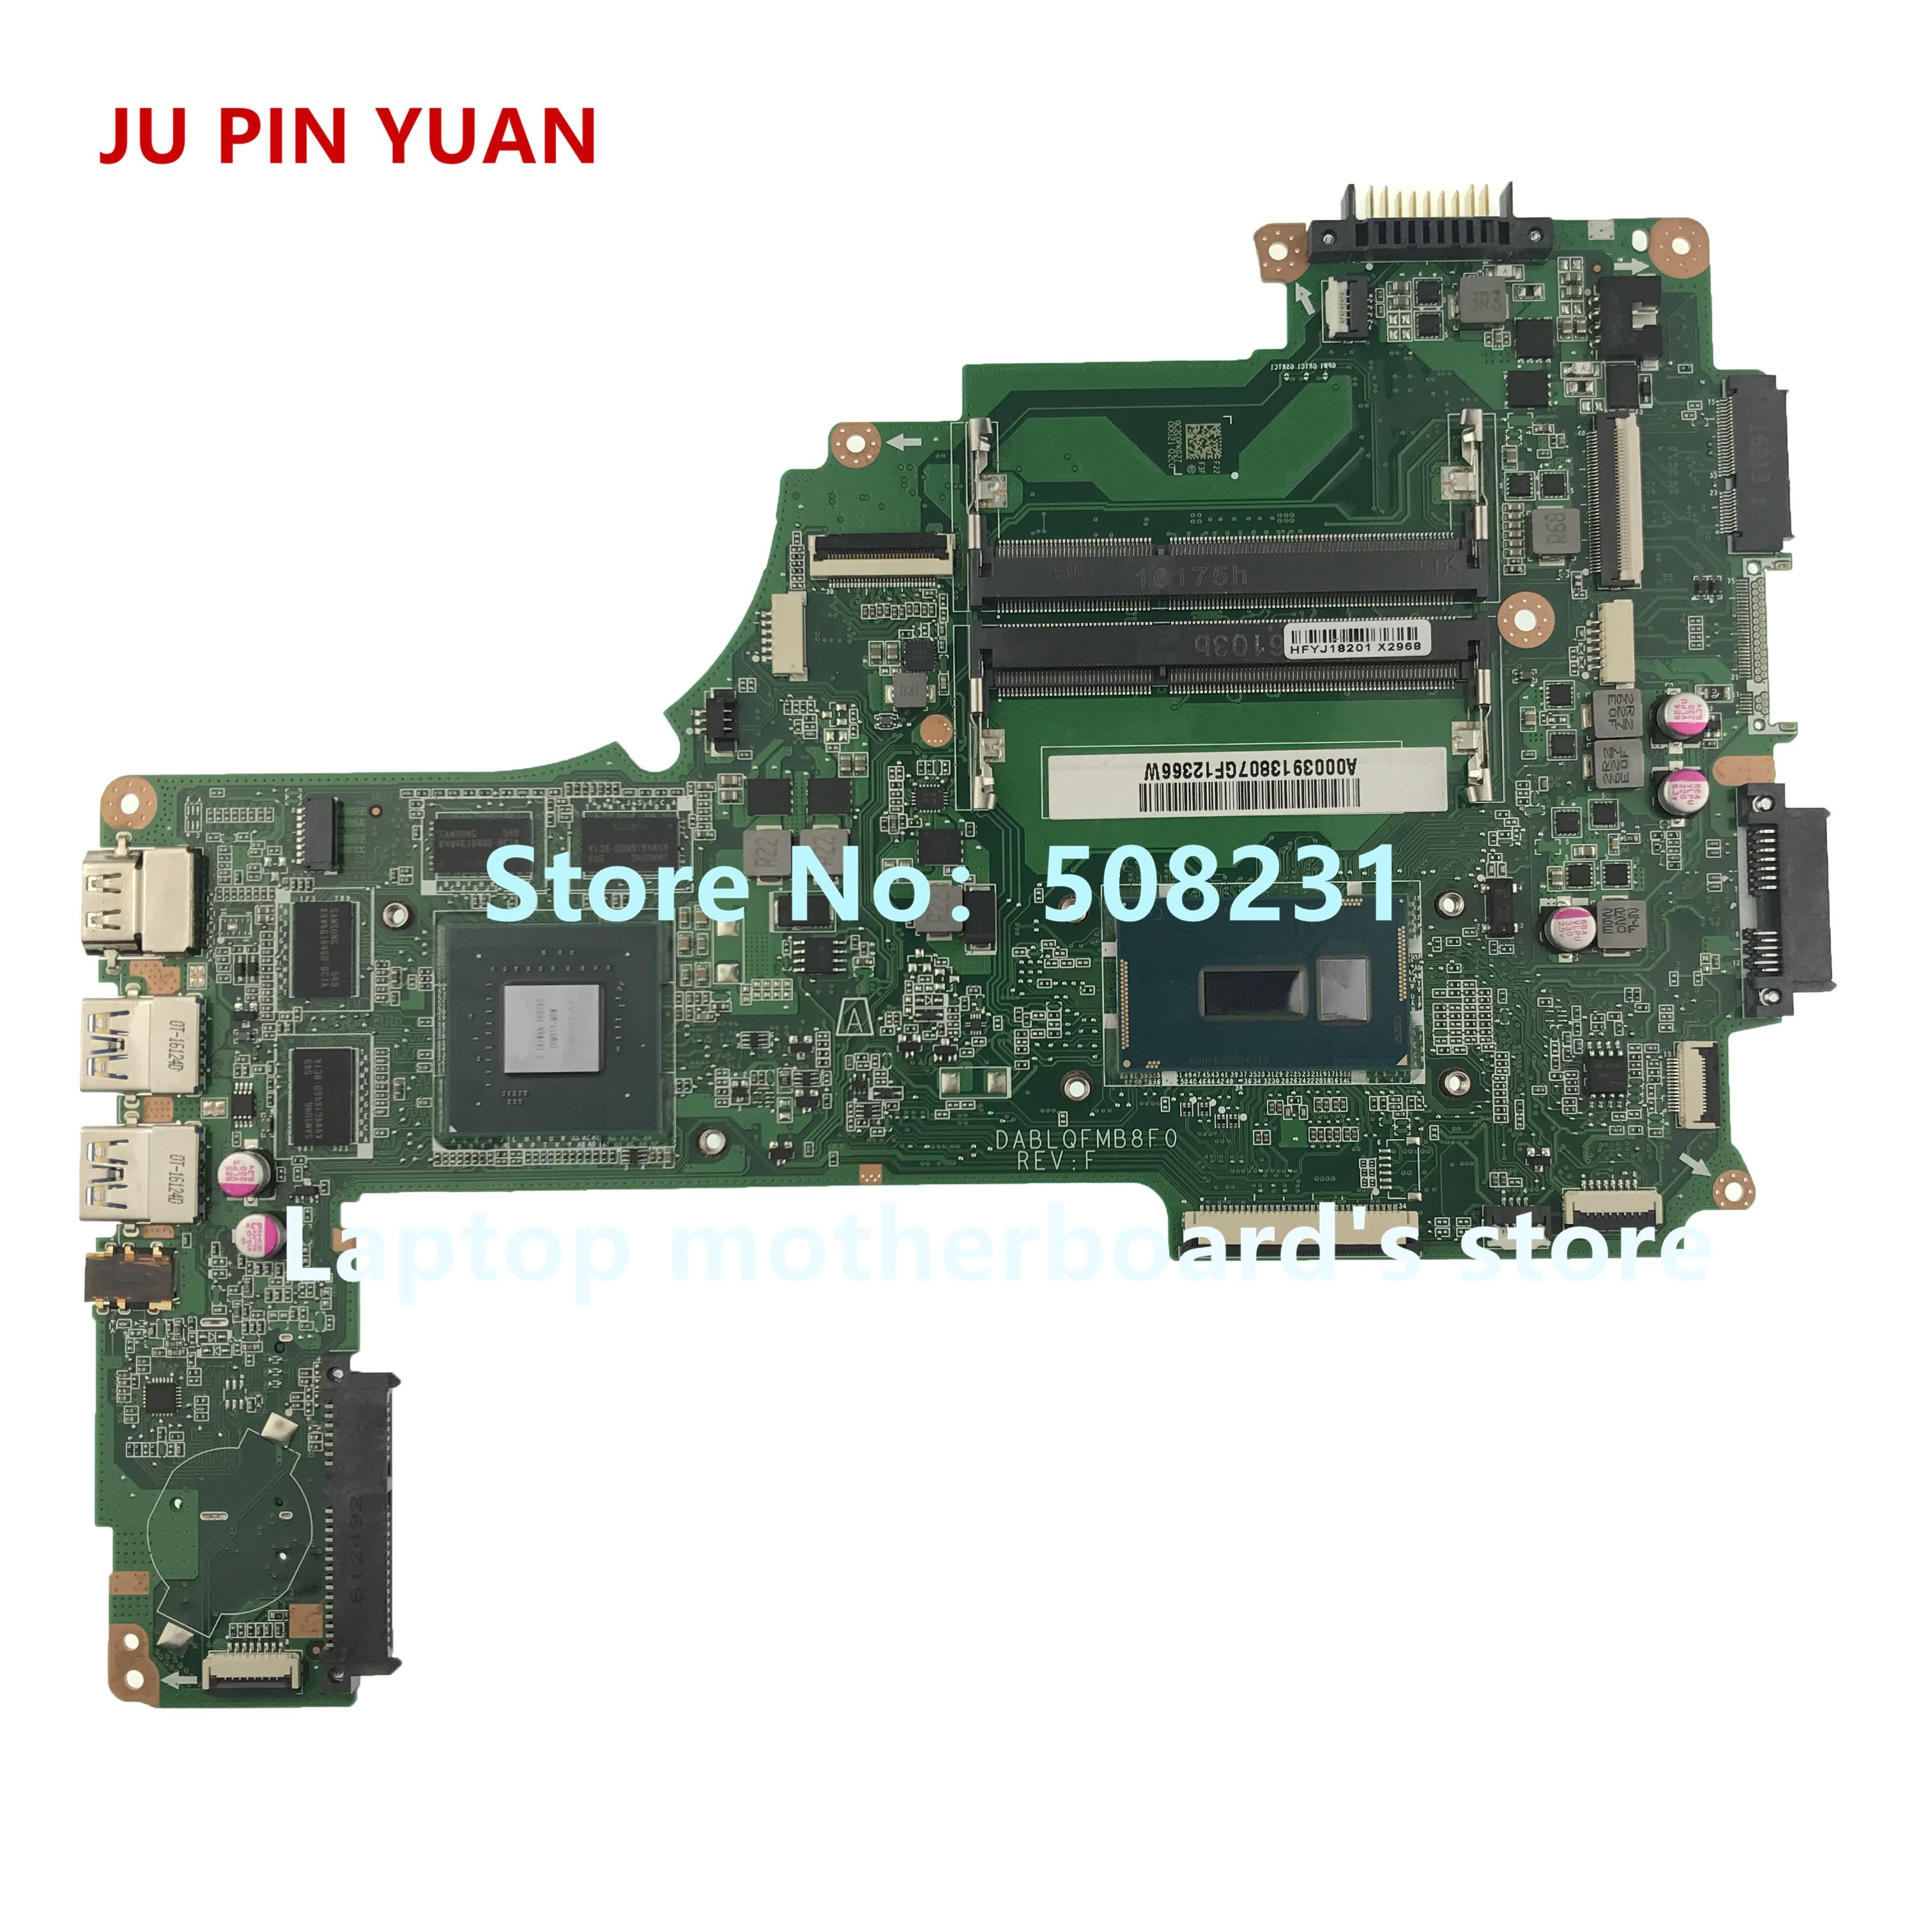 JU PIN YUAN A000391380 DABLQFMB8F0 Mainboard For TOSHIBA Satellite P50-C P55-C P50T-C Laptop Motherboard I7-5500U GTX950M